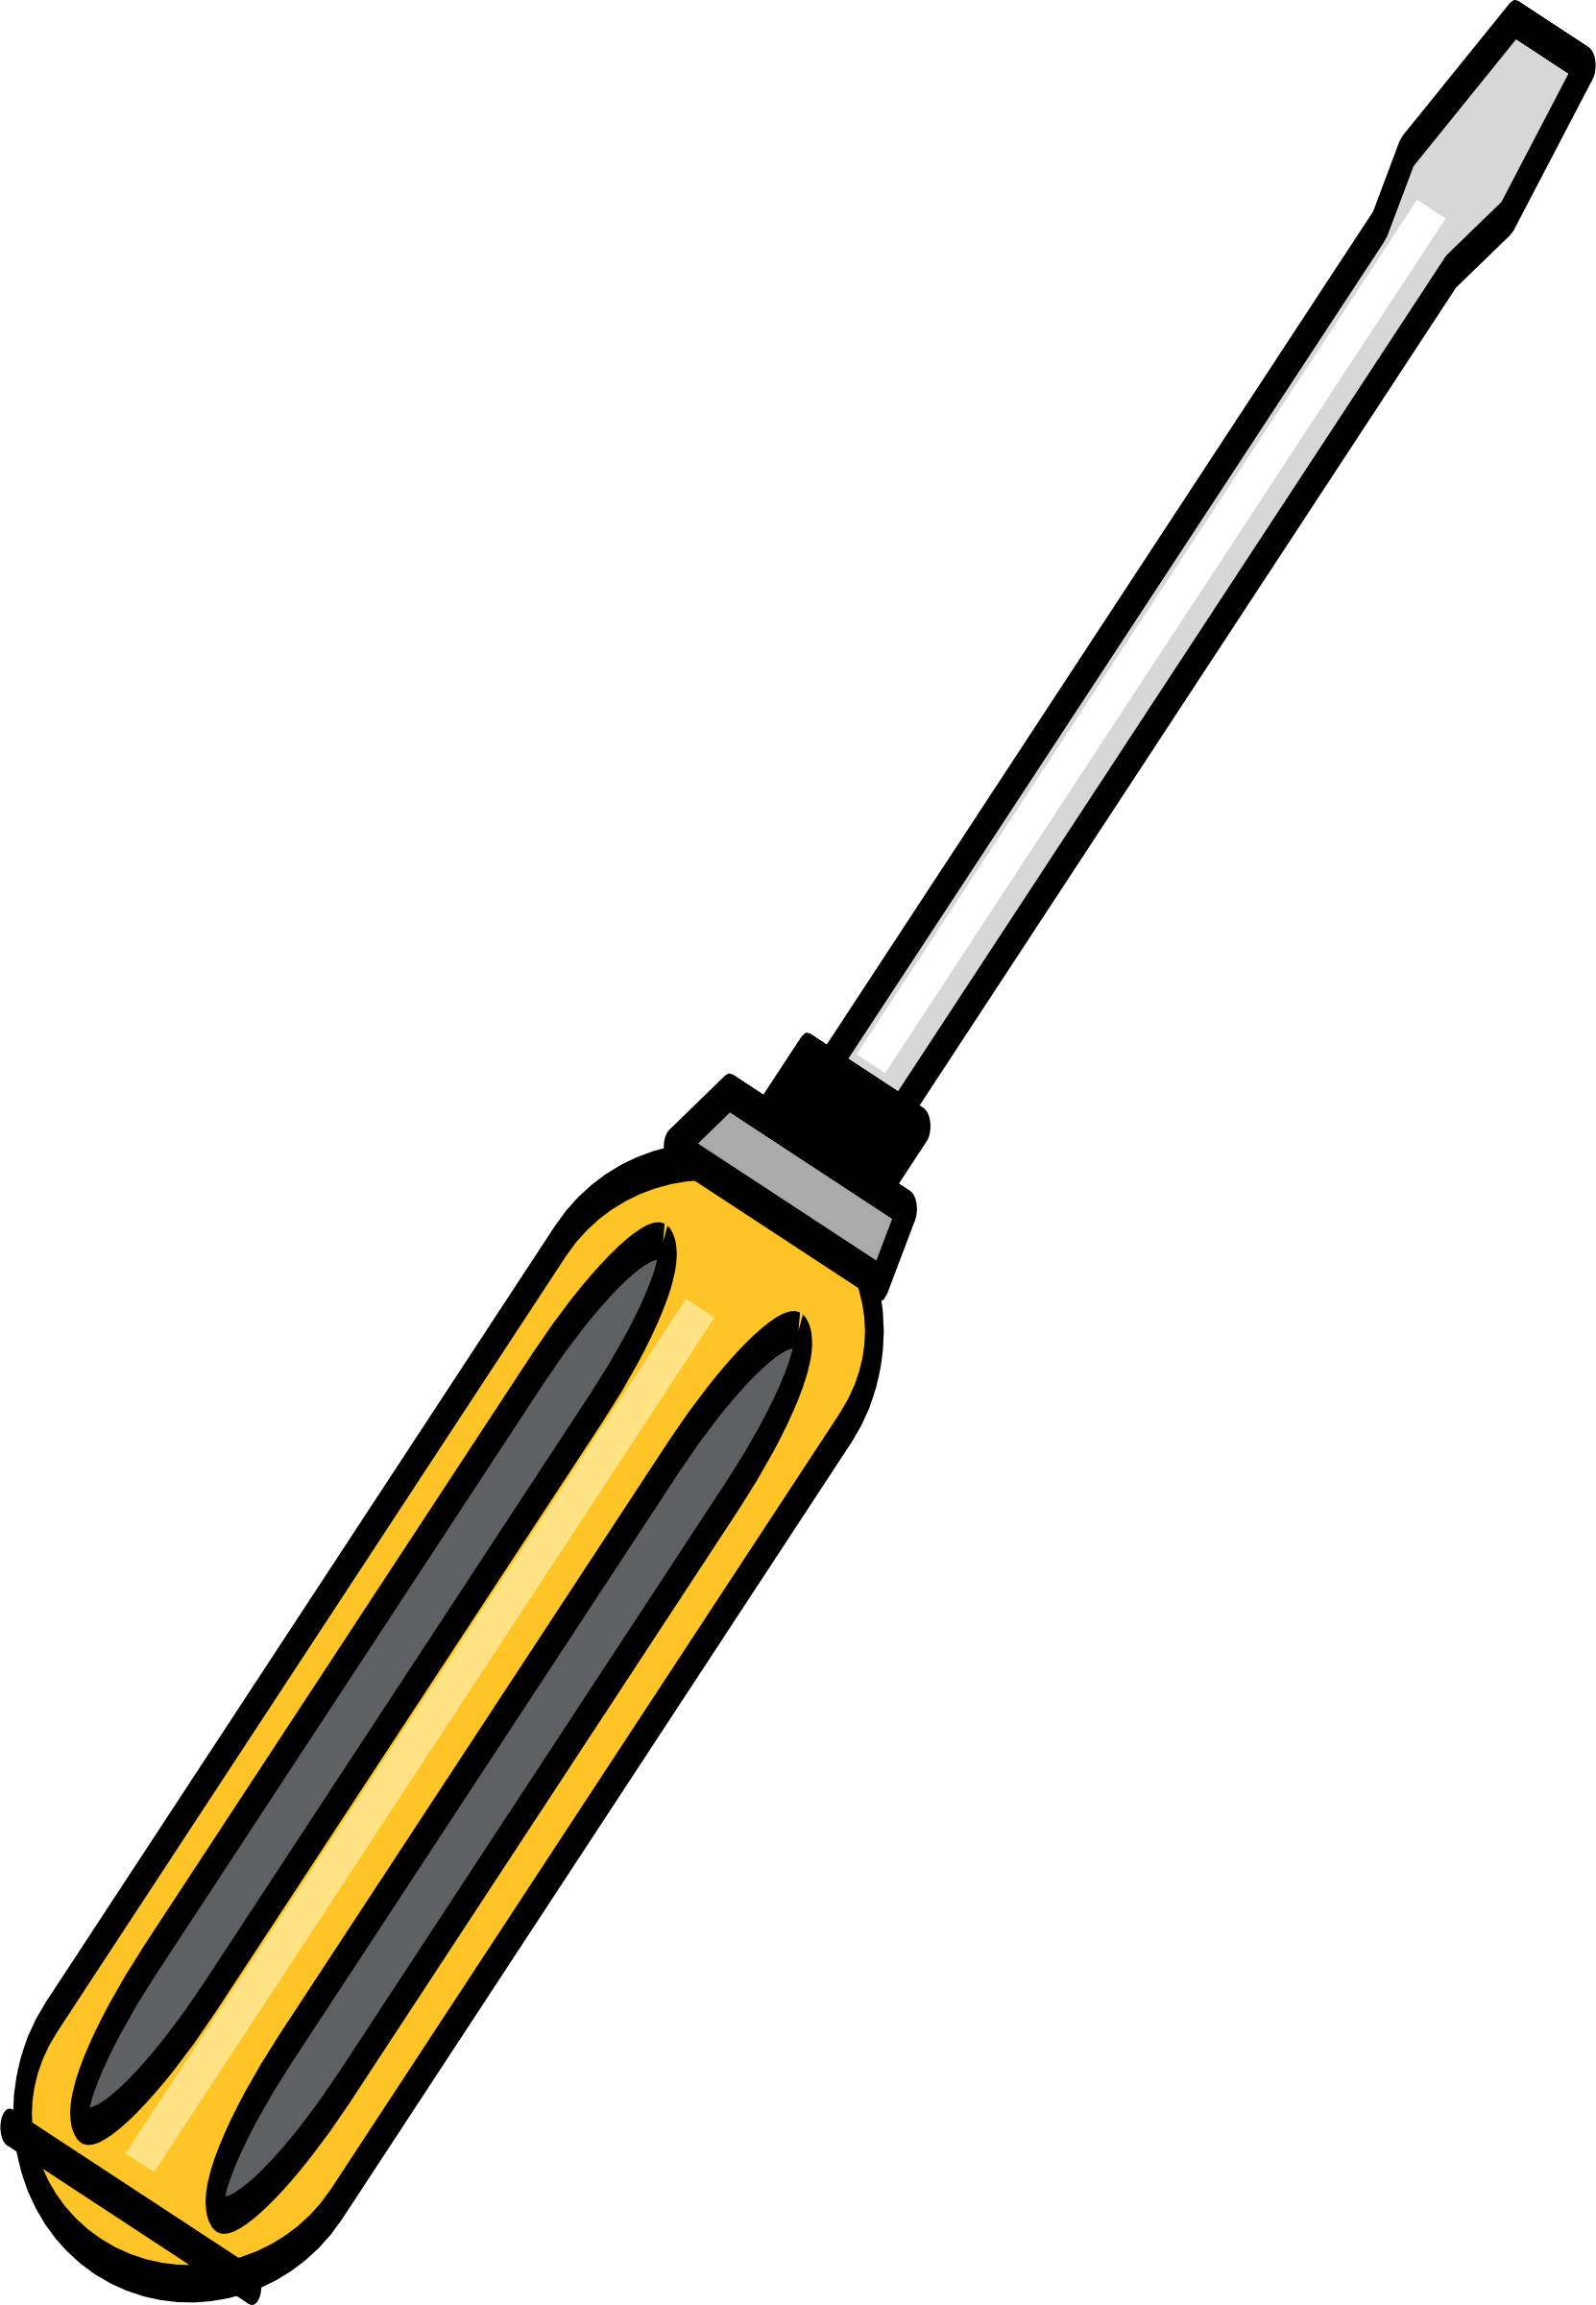 Screwdriver clipart clip art. Simple